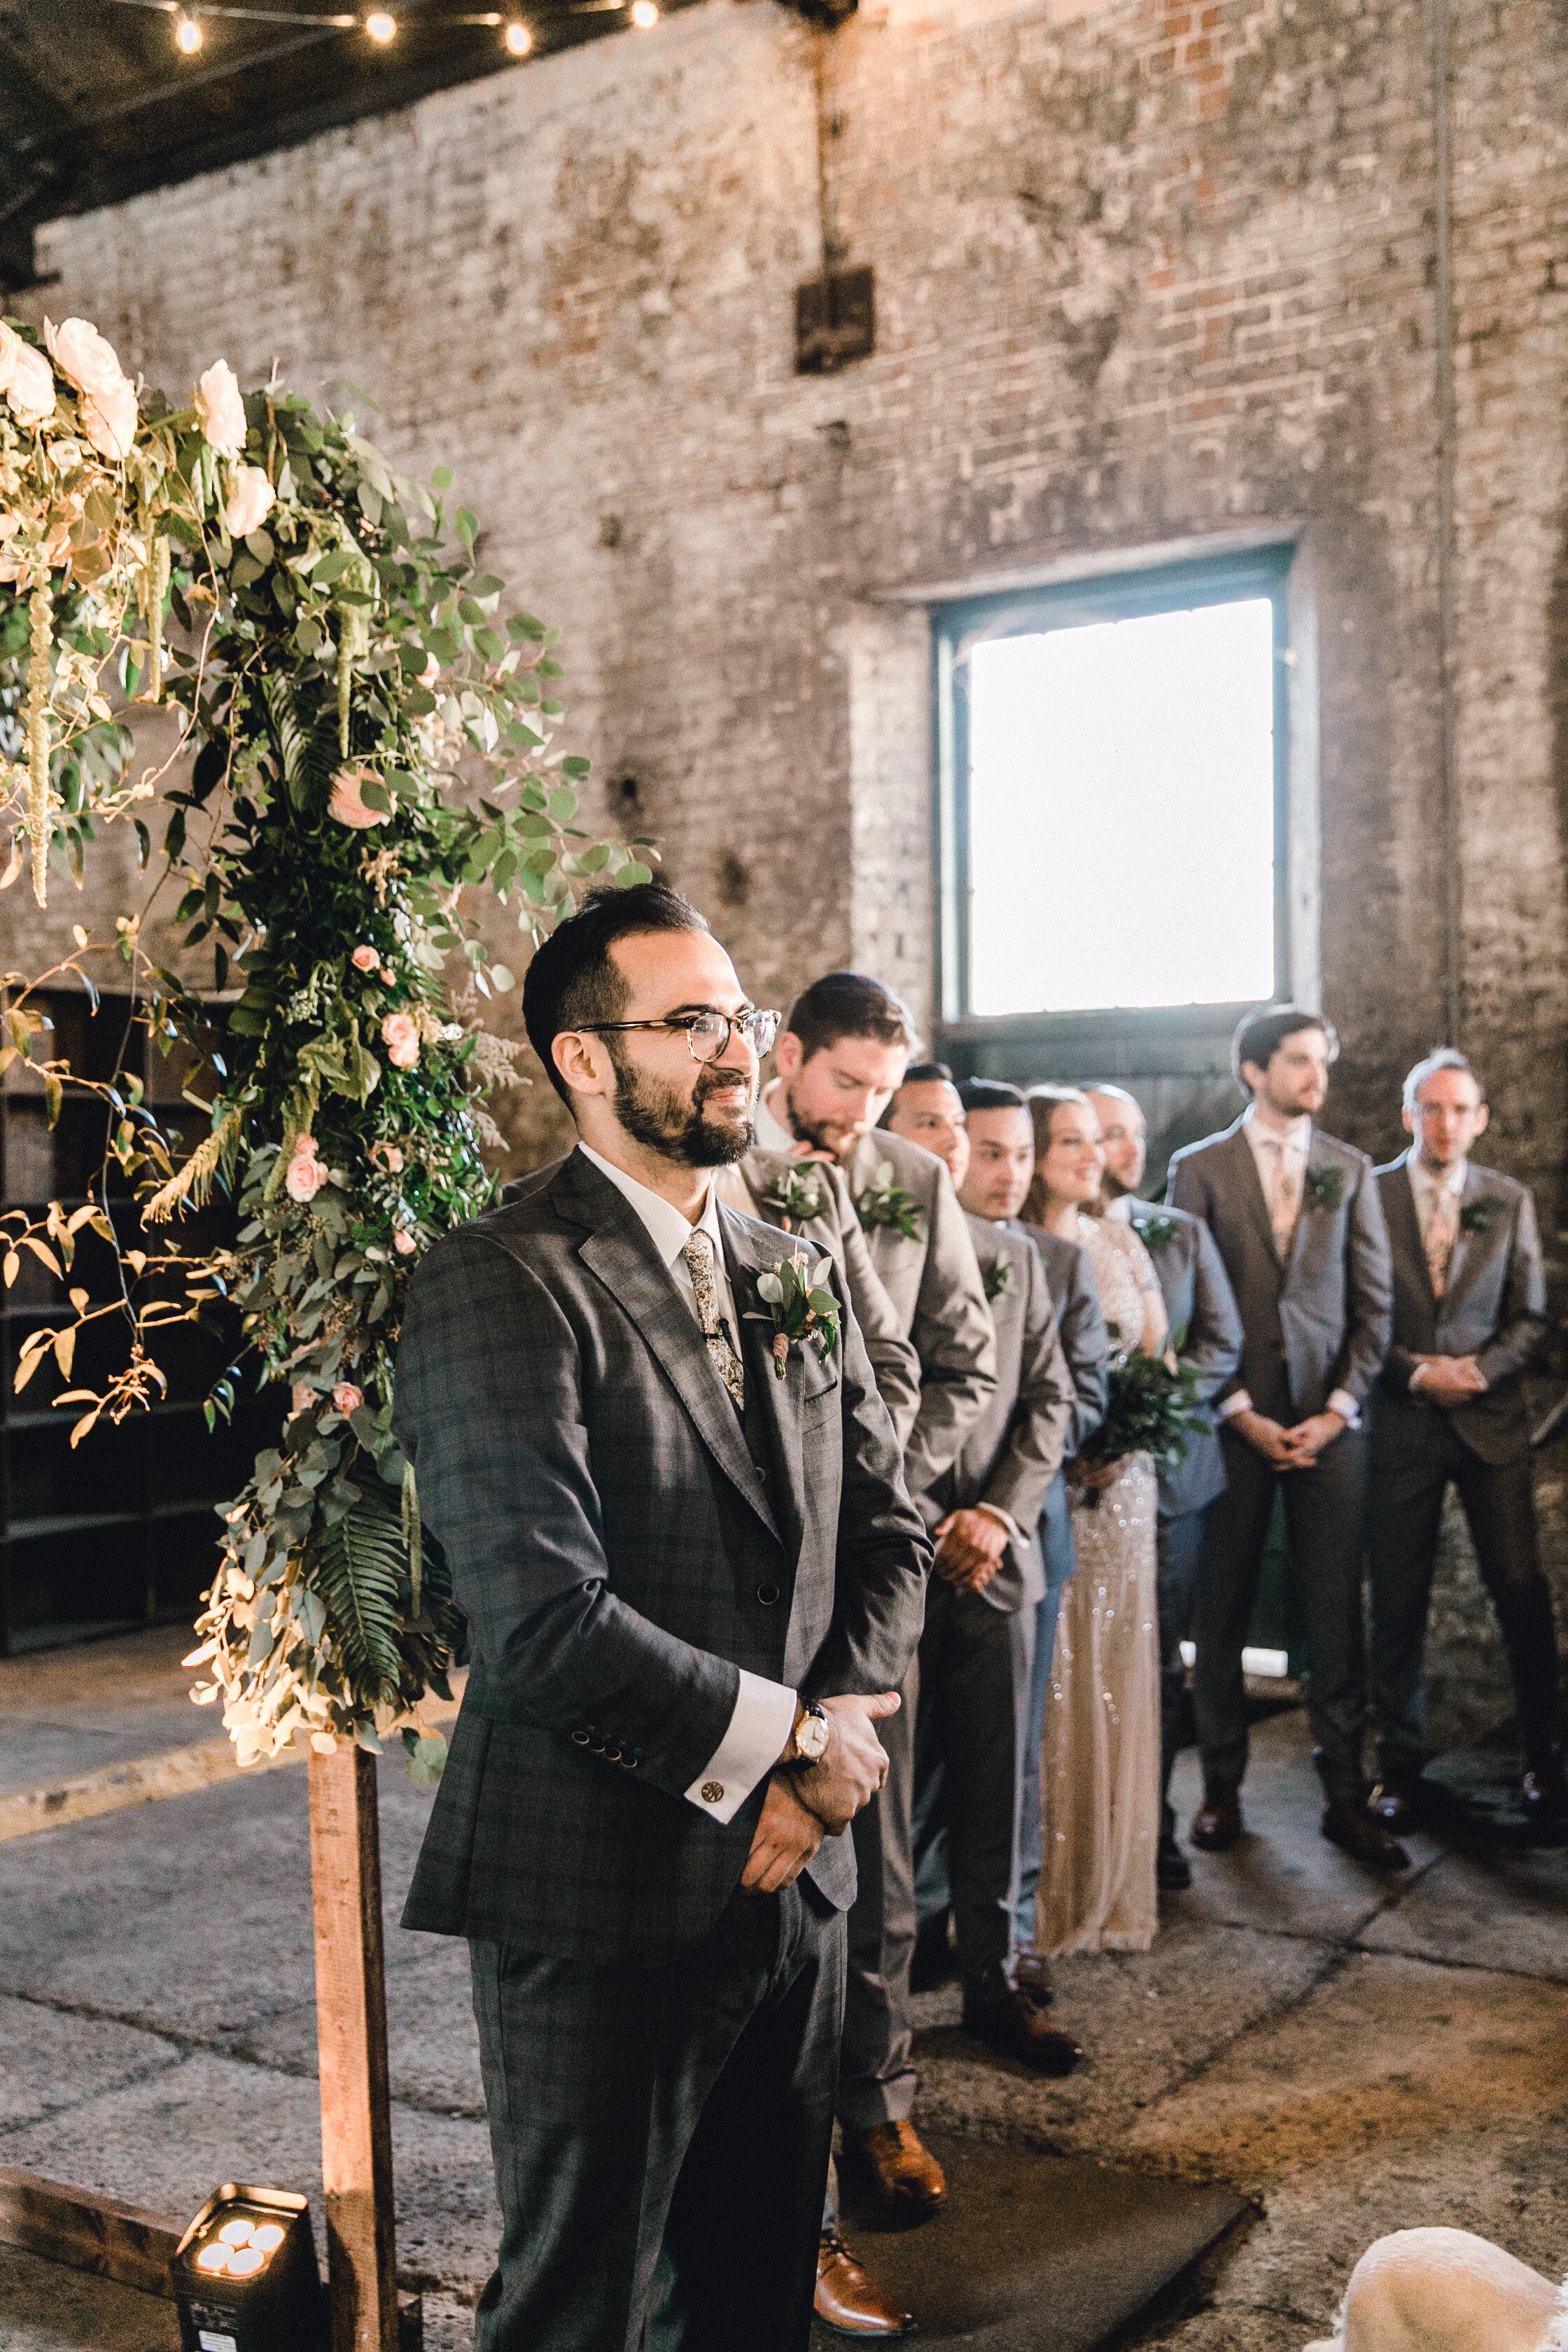 ivory-and-beau-blog-weddings-ivory-and-beau-couple-dominique-and-andres-savannah-florist-wedding-planning-savannah-bridal-boutique-wedding-flowers-KIP_WEBERWEDDING_RAILROADMUSEUM-965.JPG